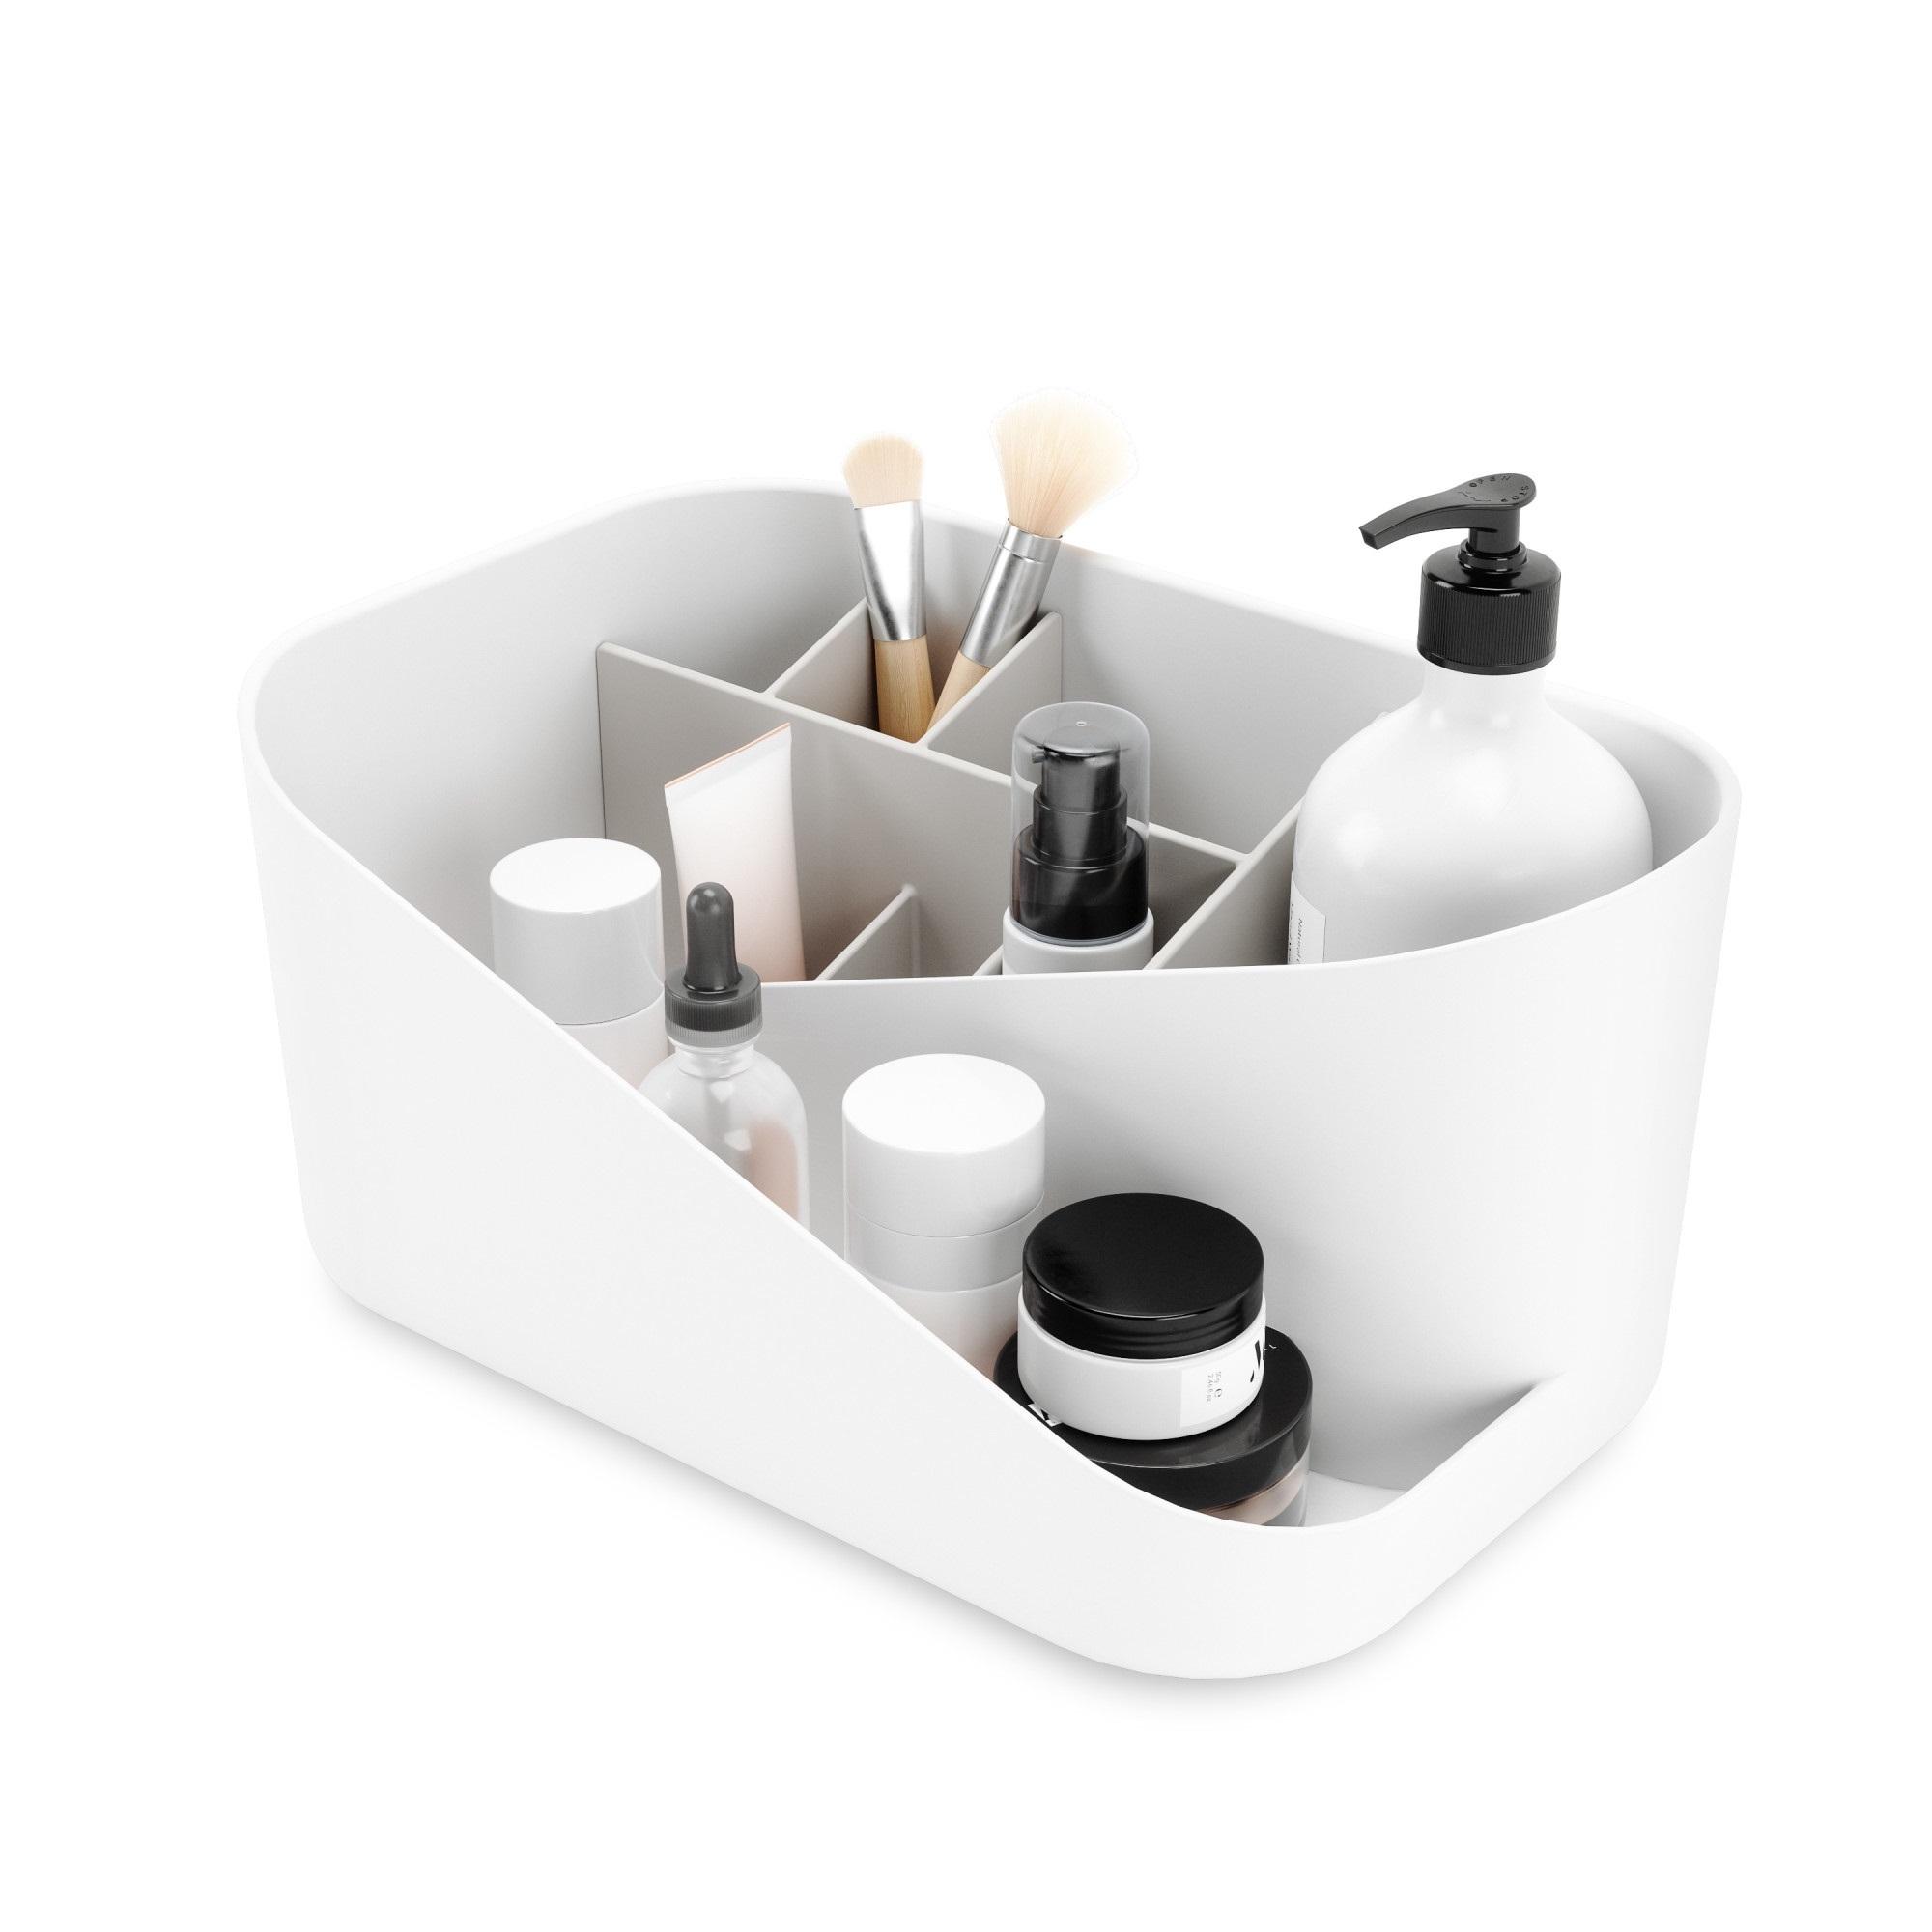 Umbra Glam Cosmetic Organizer White & Grey